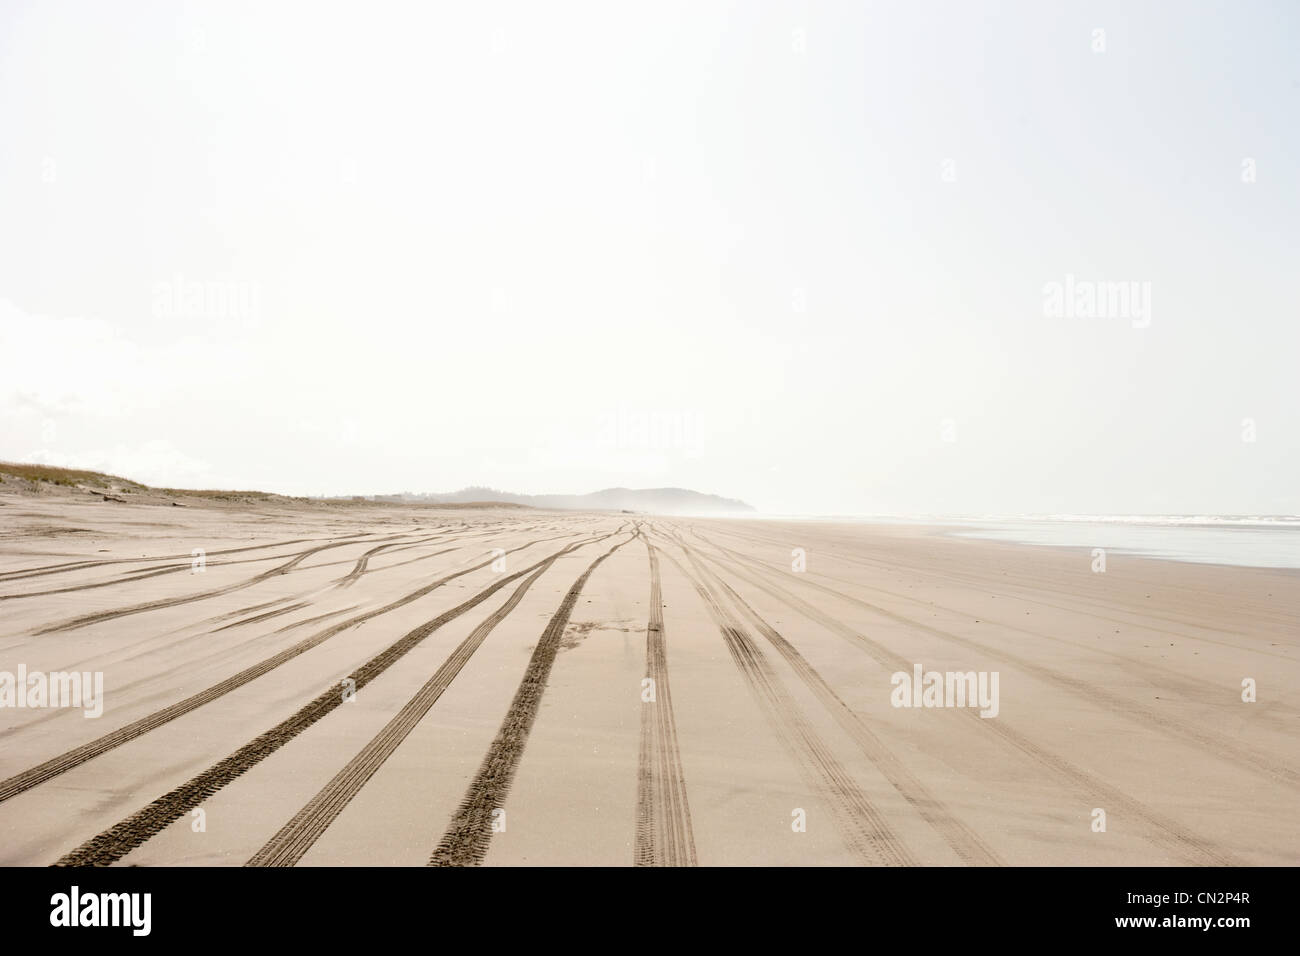 Boy on sandy beach with tire tracks - Stock Image